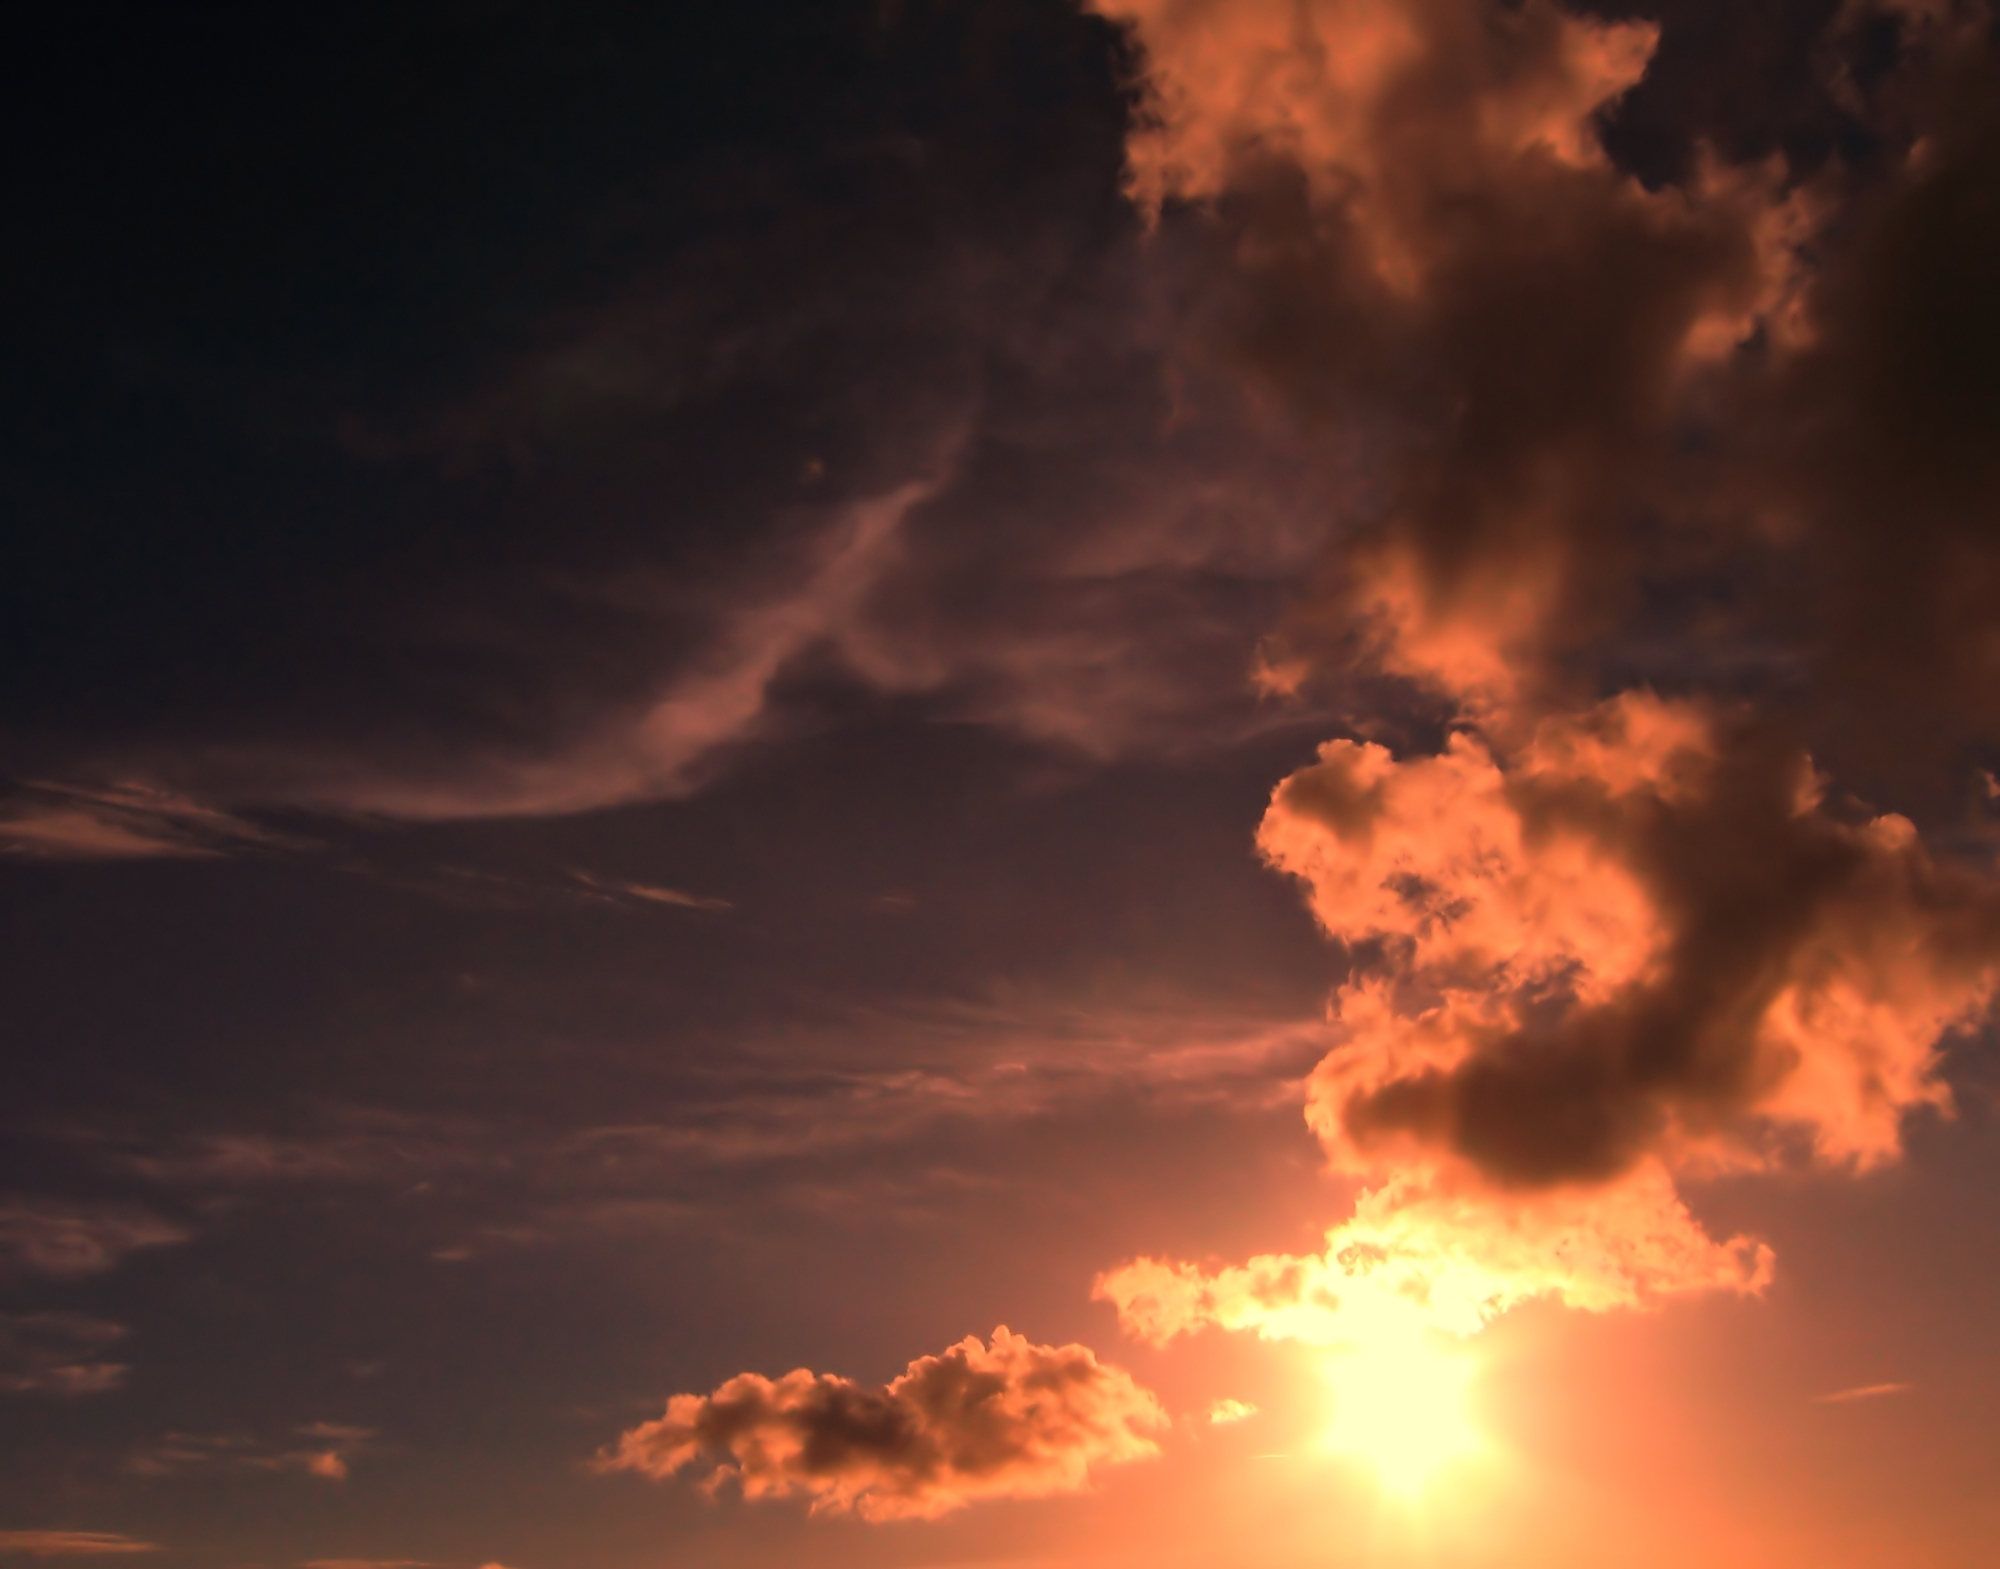 Sunset and gathering storm photo